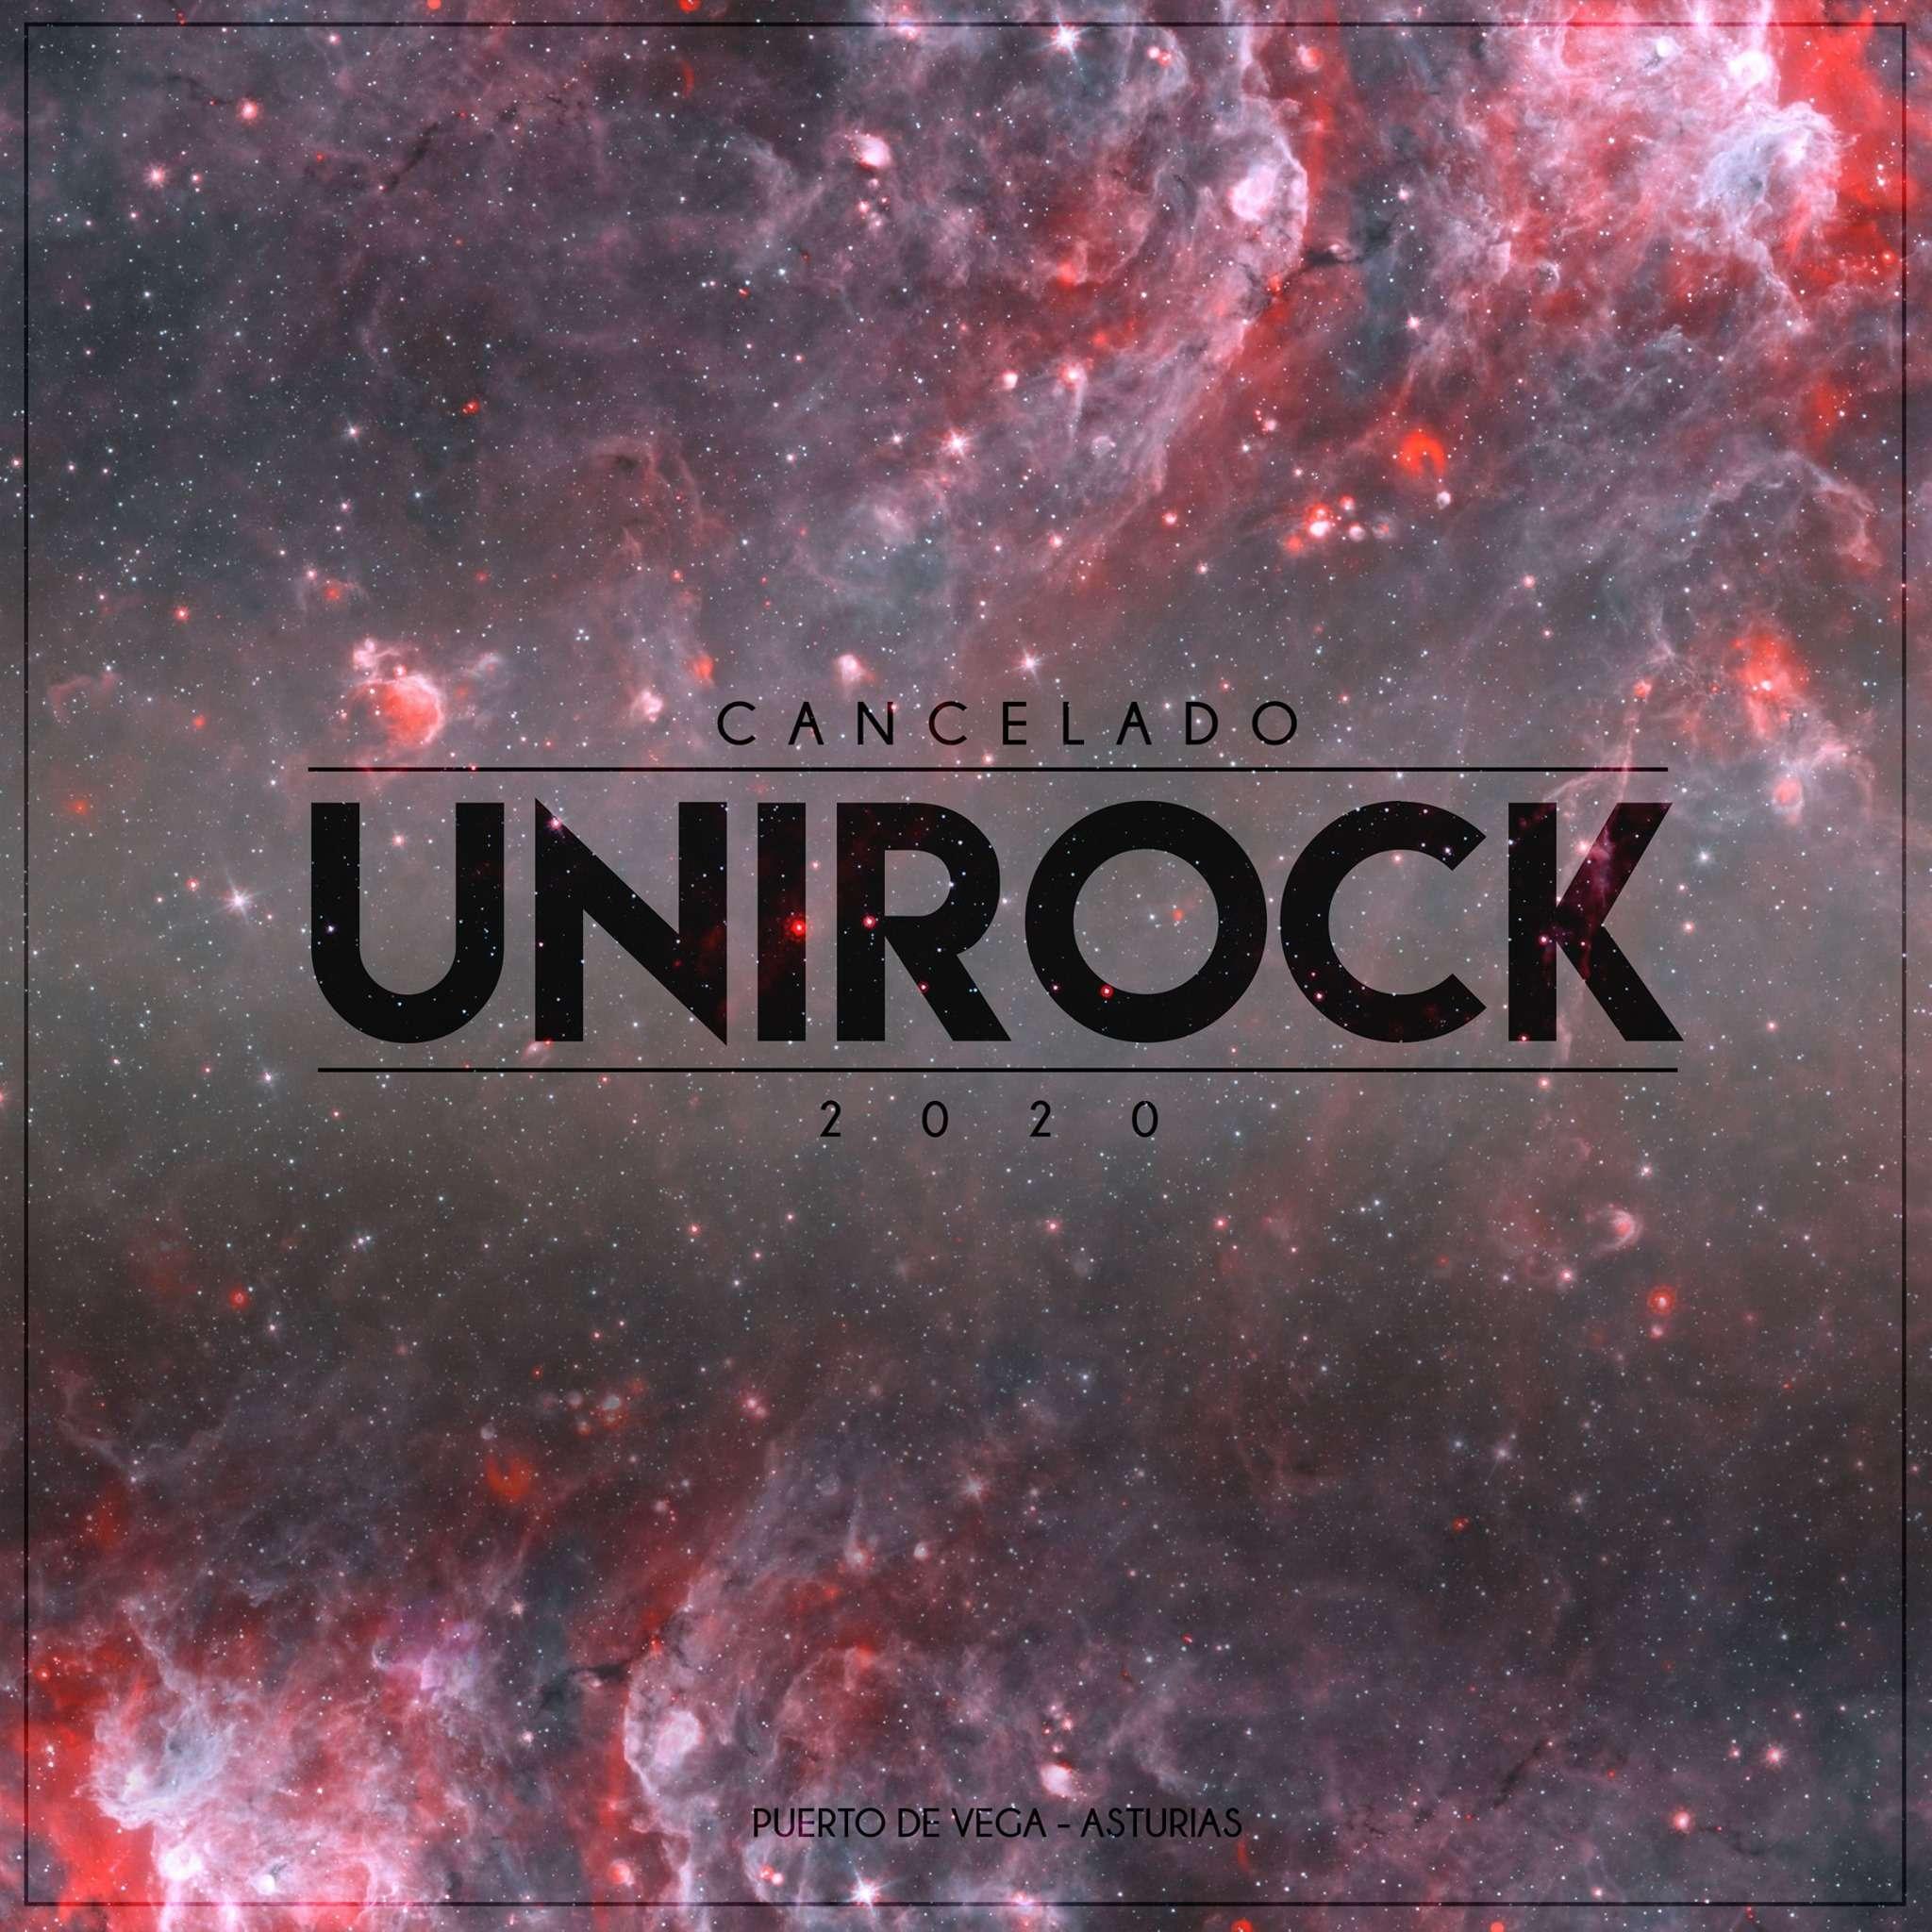 Unirock